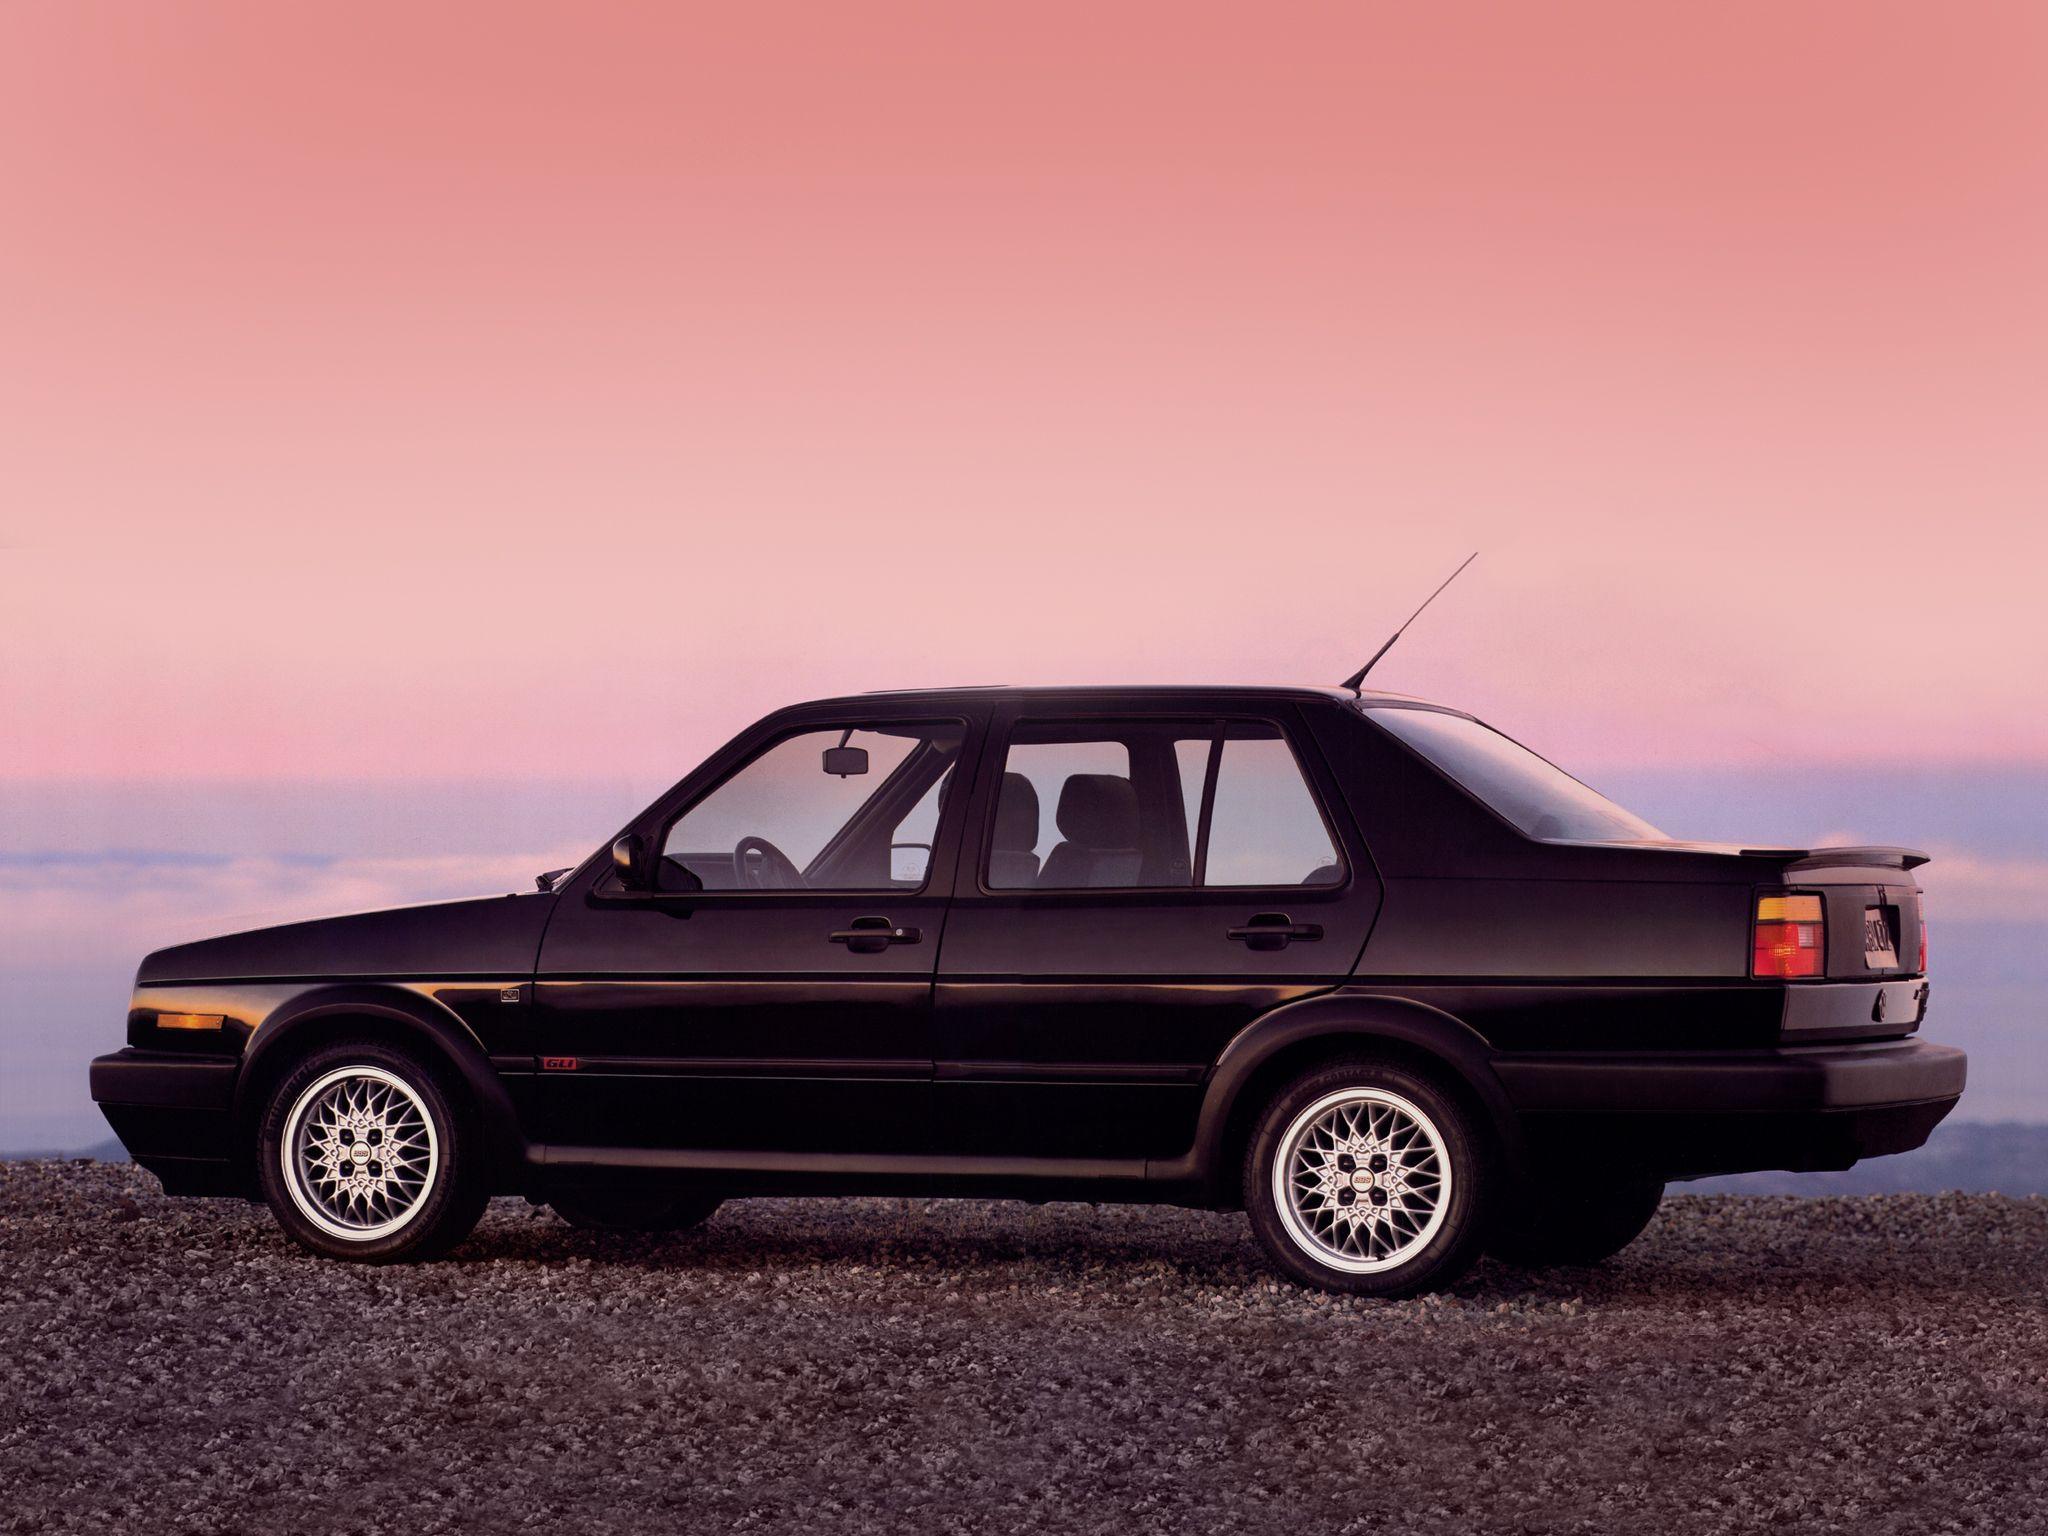 1990 jetta gli wolfsburg edition